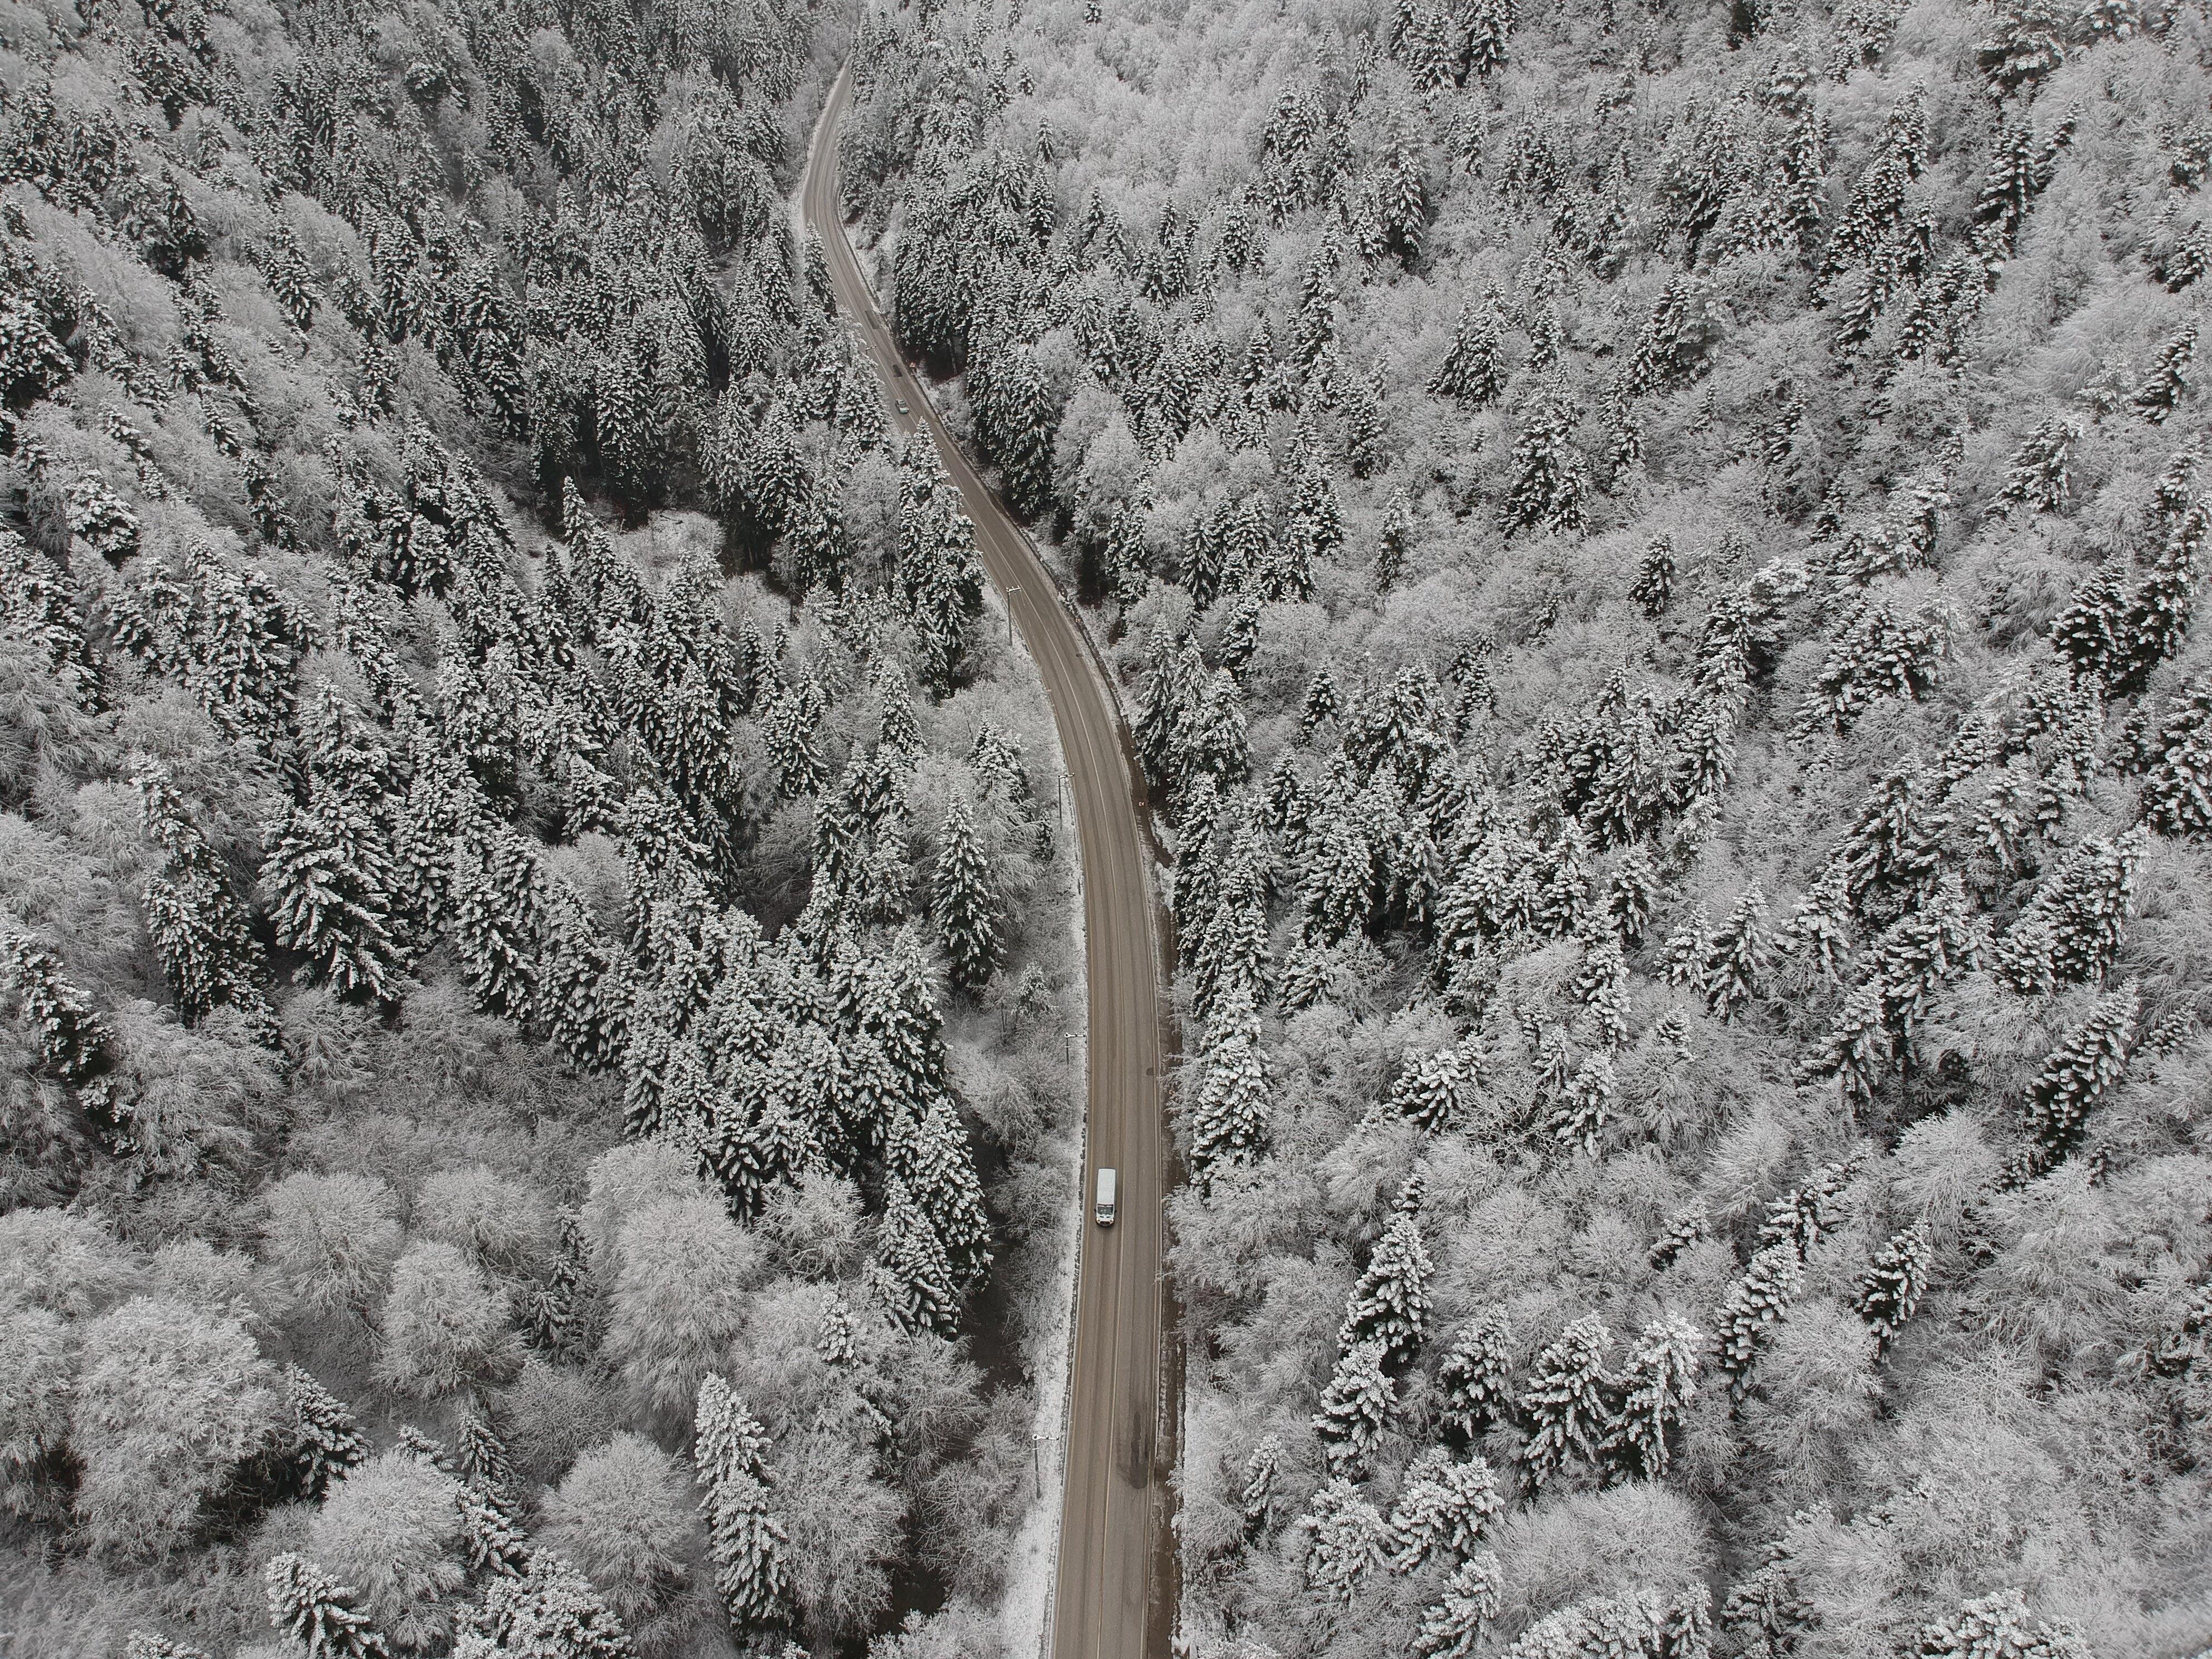 Snow turns cities into winter wonderland in Turkey